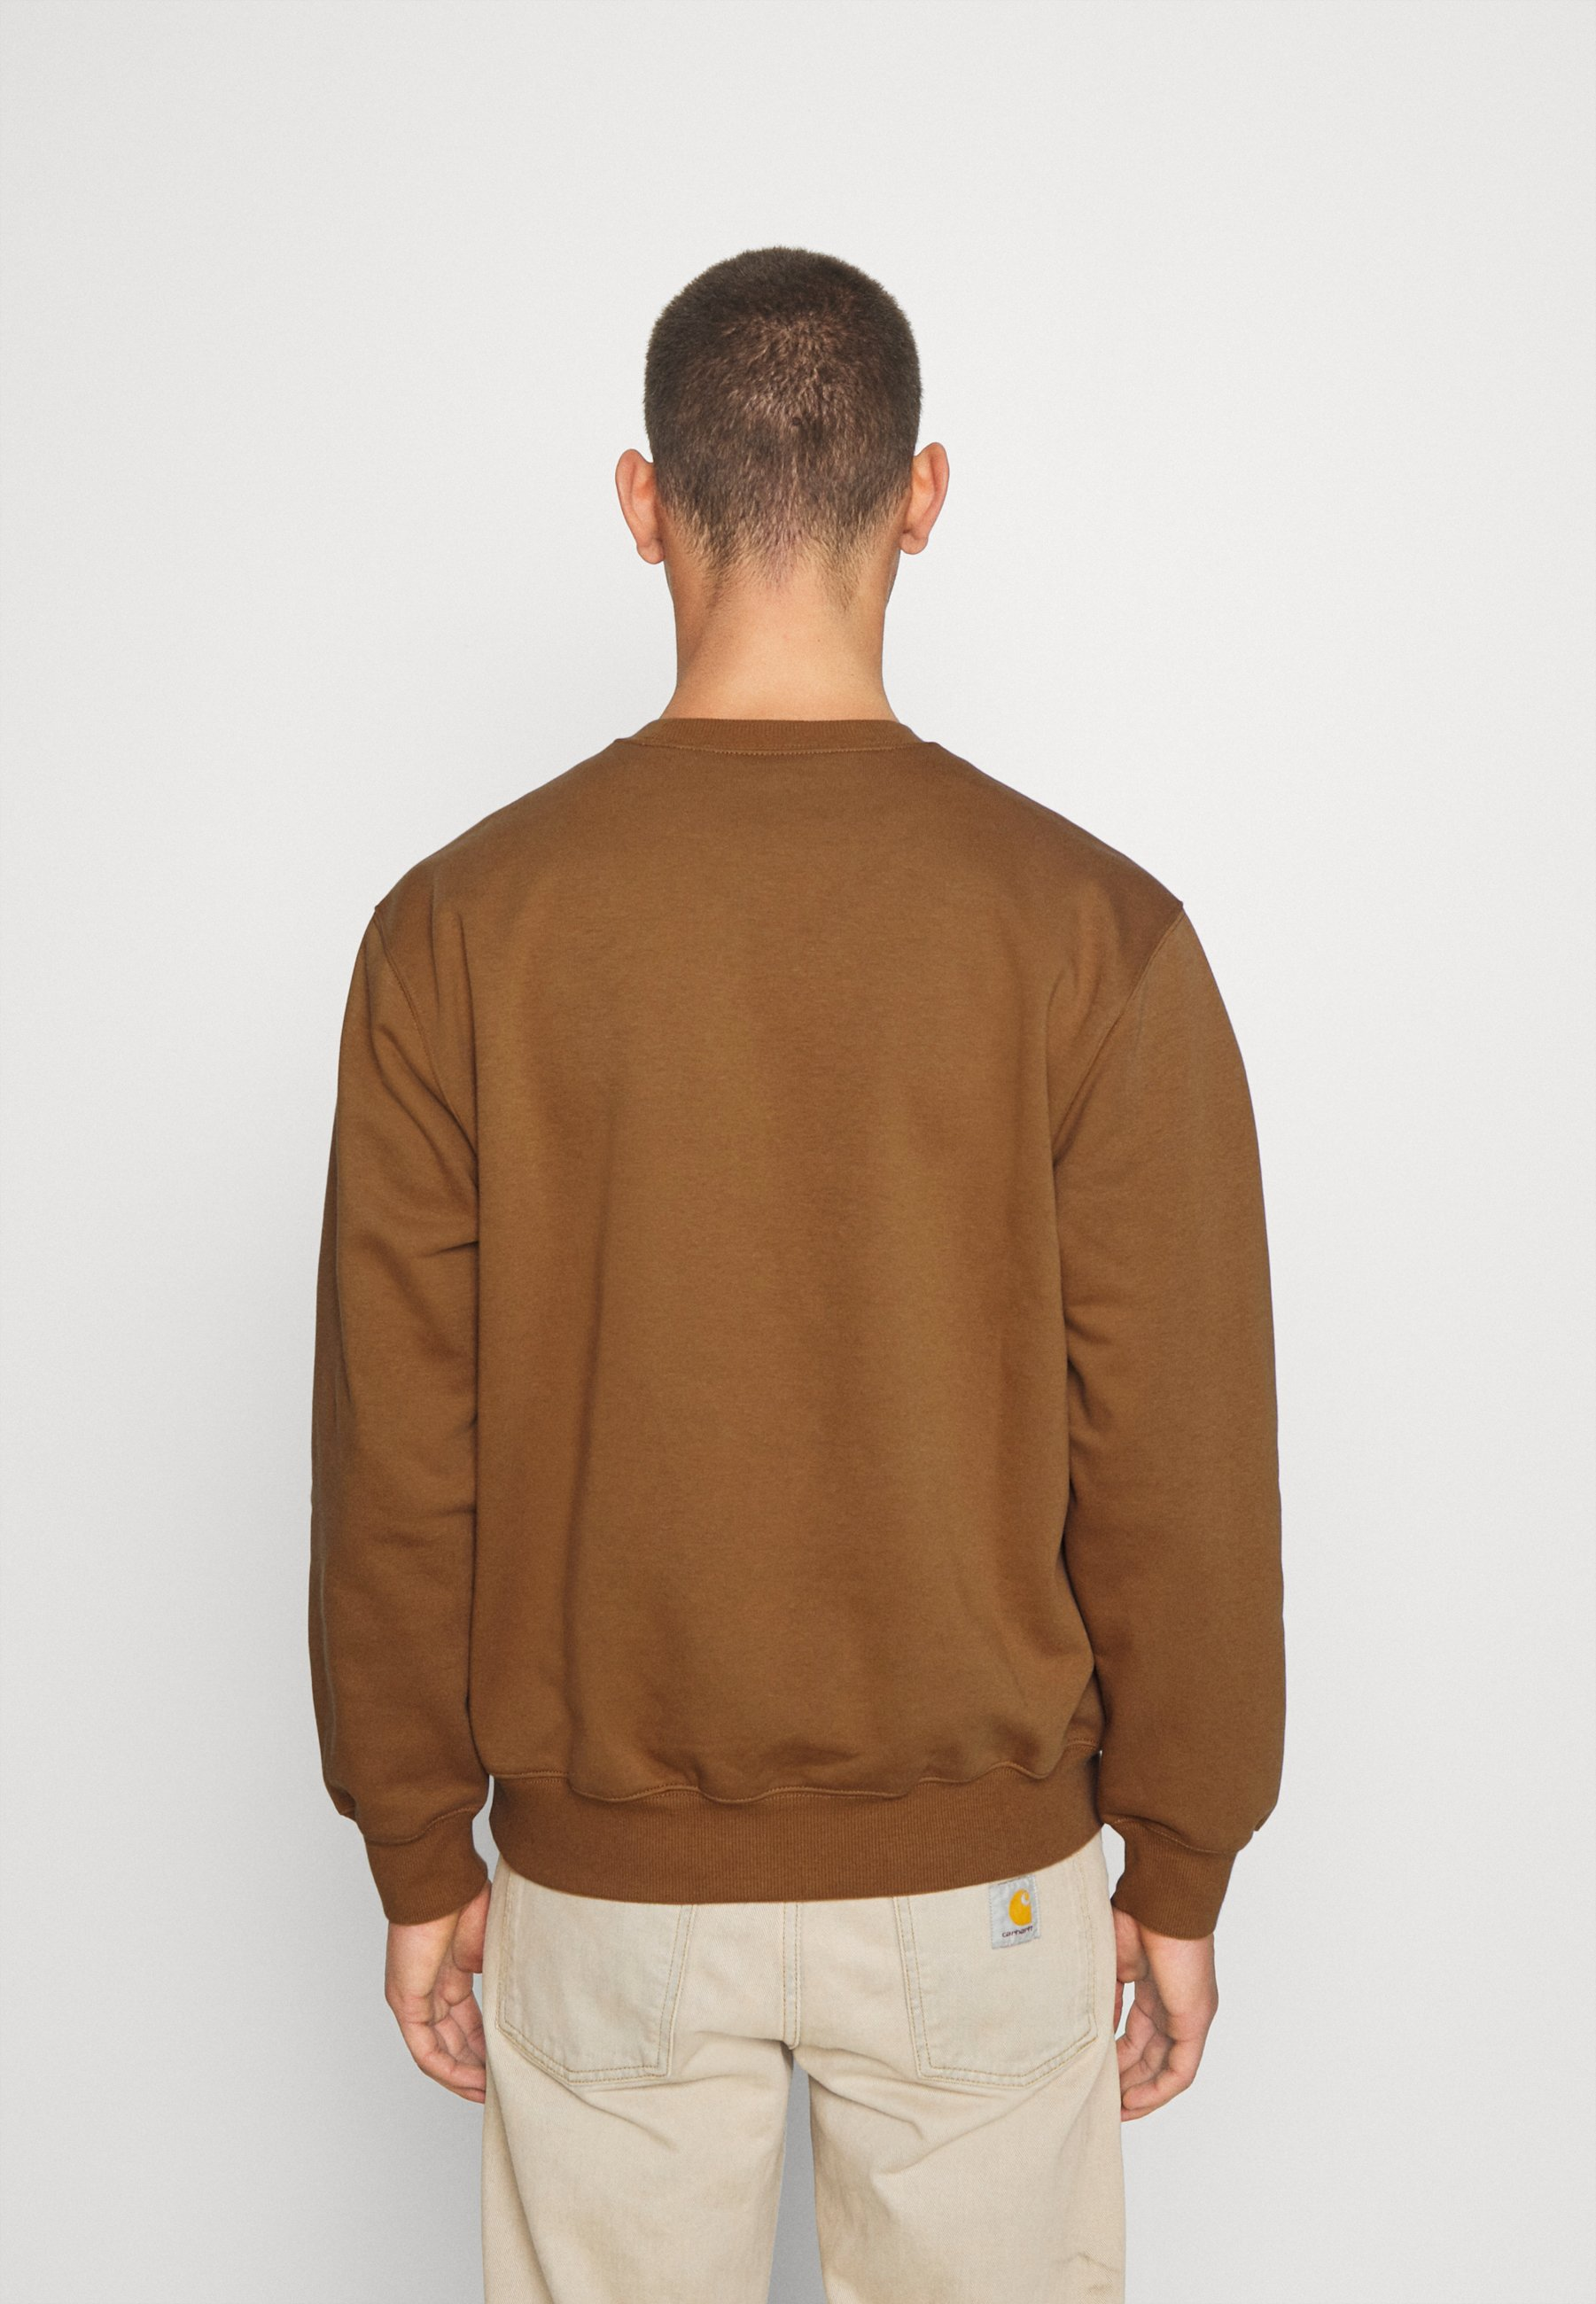 Carhartt WIP Sweatshirt hamilton brownblackbraun